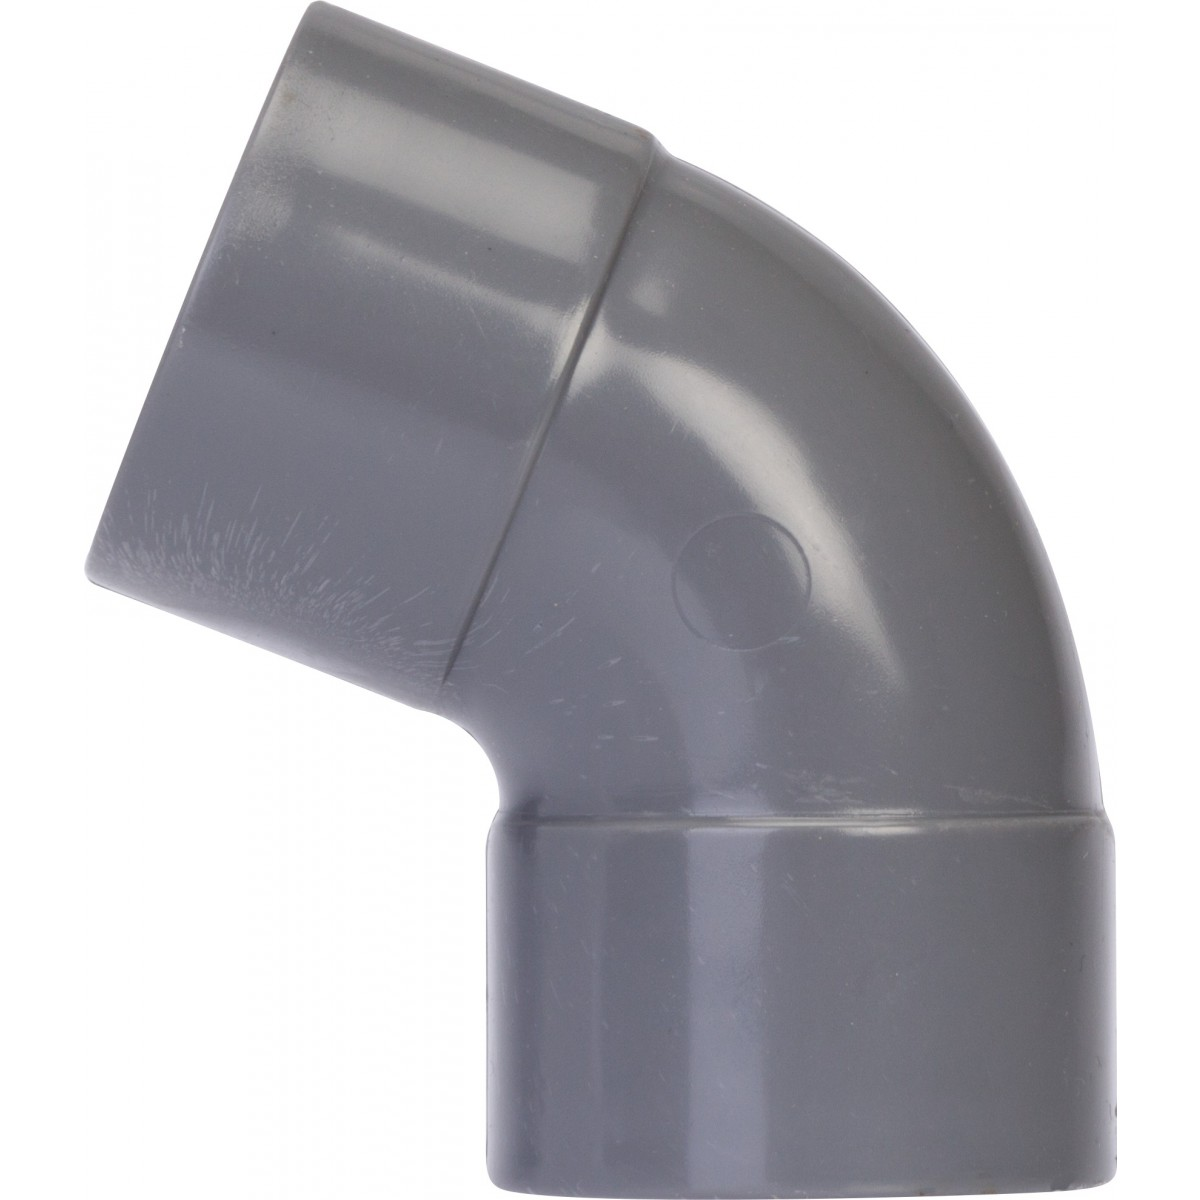 Coude à 67°30 Femelle / Femelle Girpi - Diamètre 125 mm